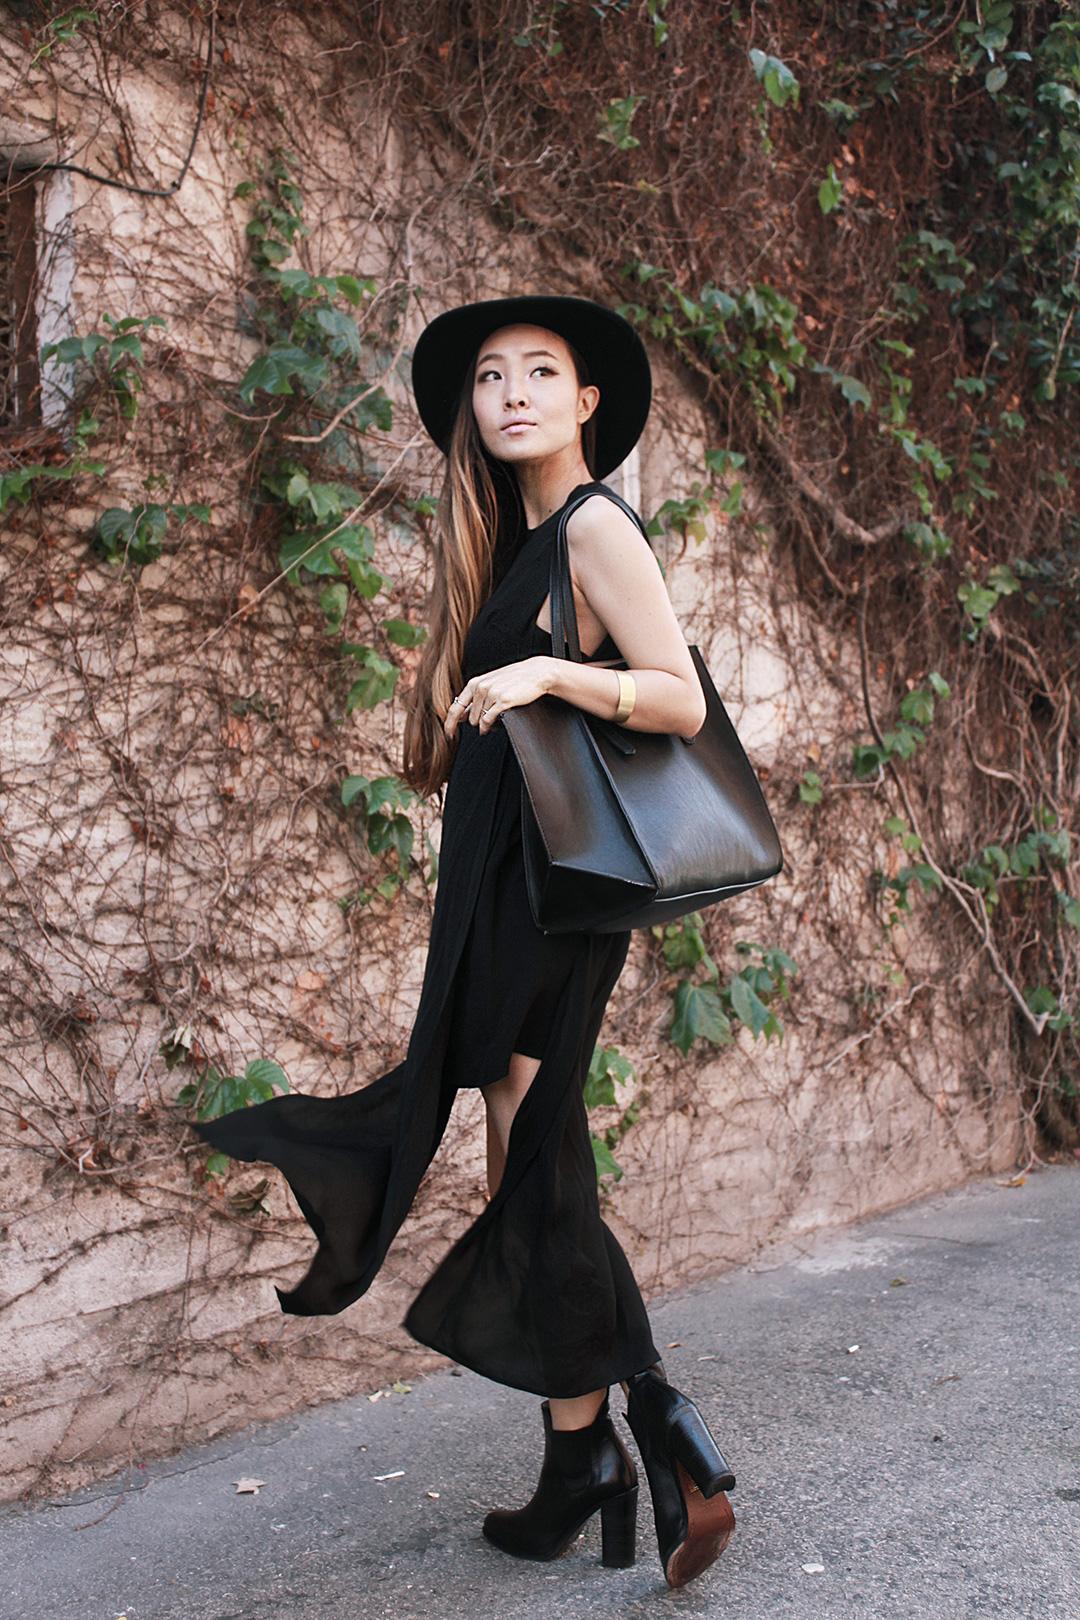 Stylenanda hat, A.L.C. dress, Zara bag, Rag & Bone boots, Madewell bracelets